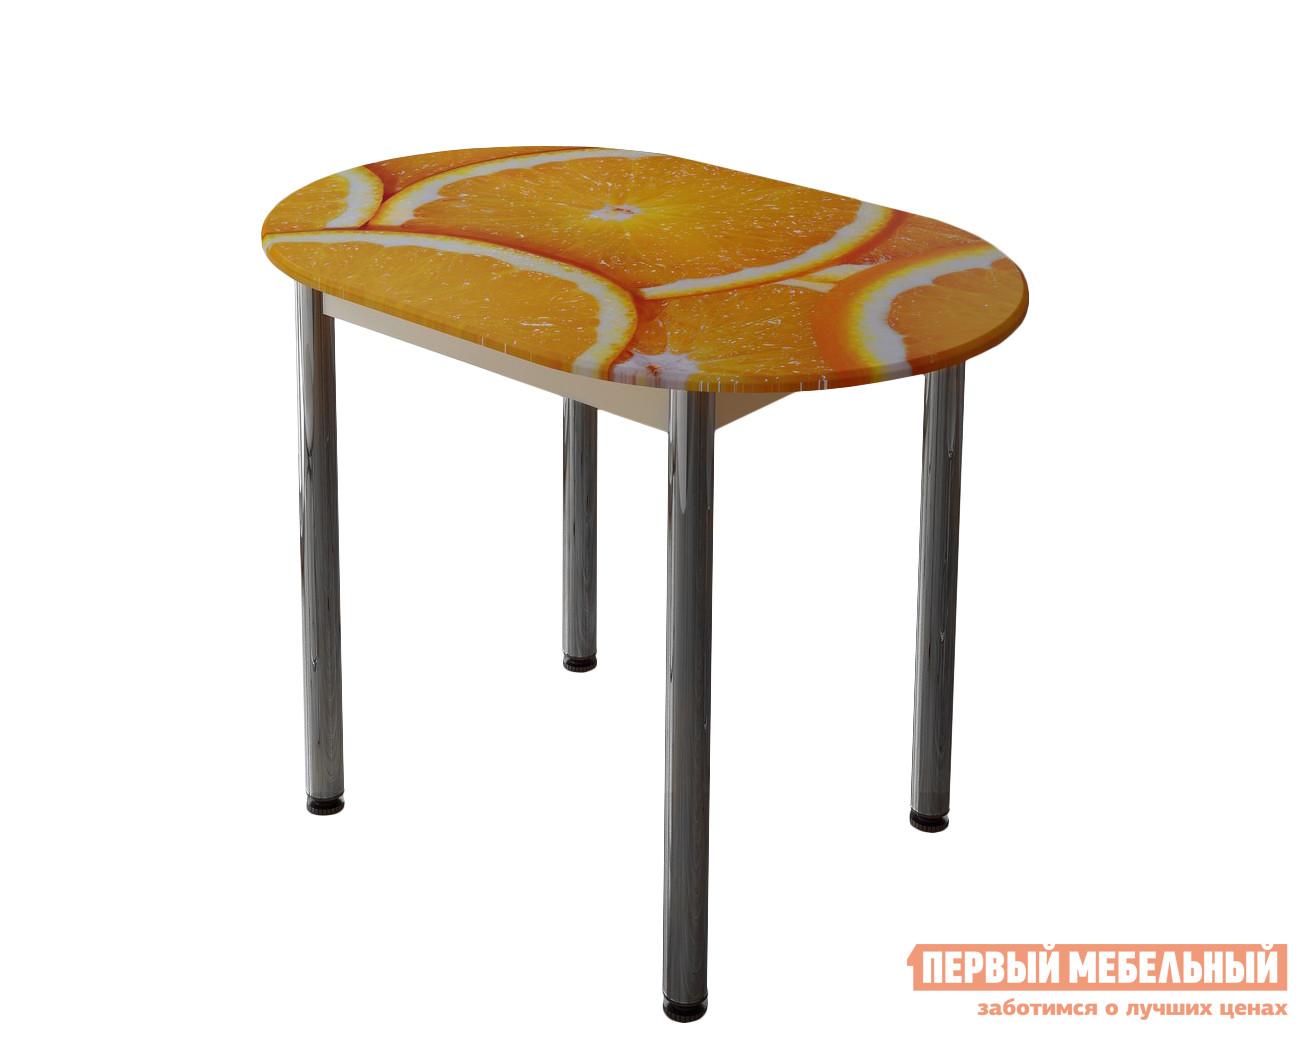 Обеденный стол ТД Арника Обеденный стол BTS